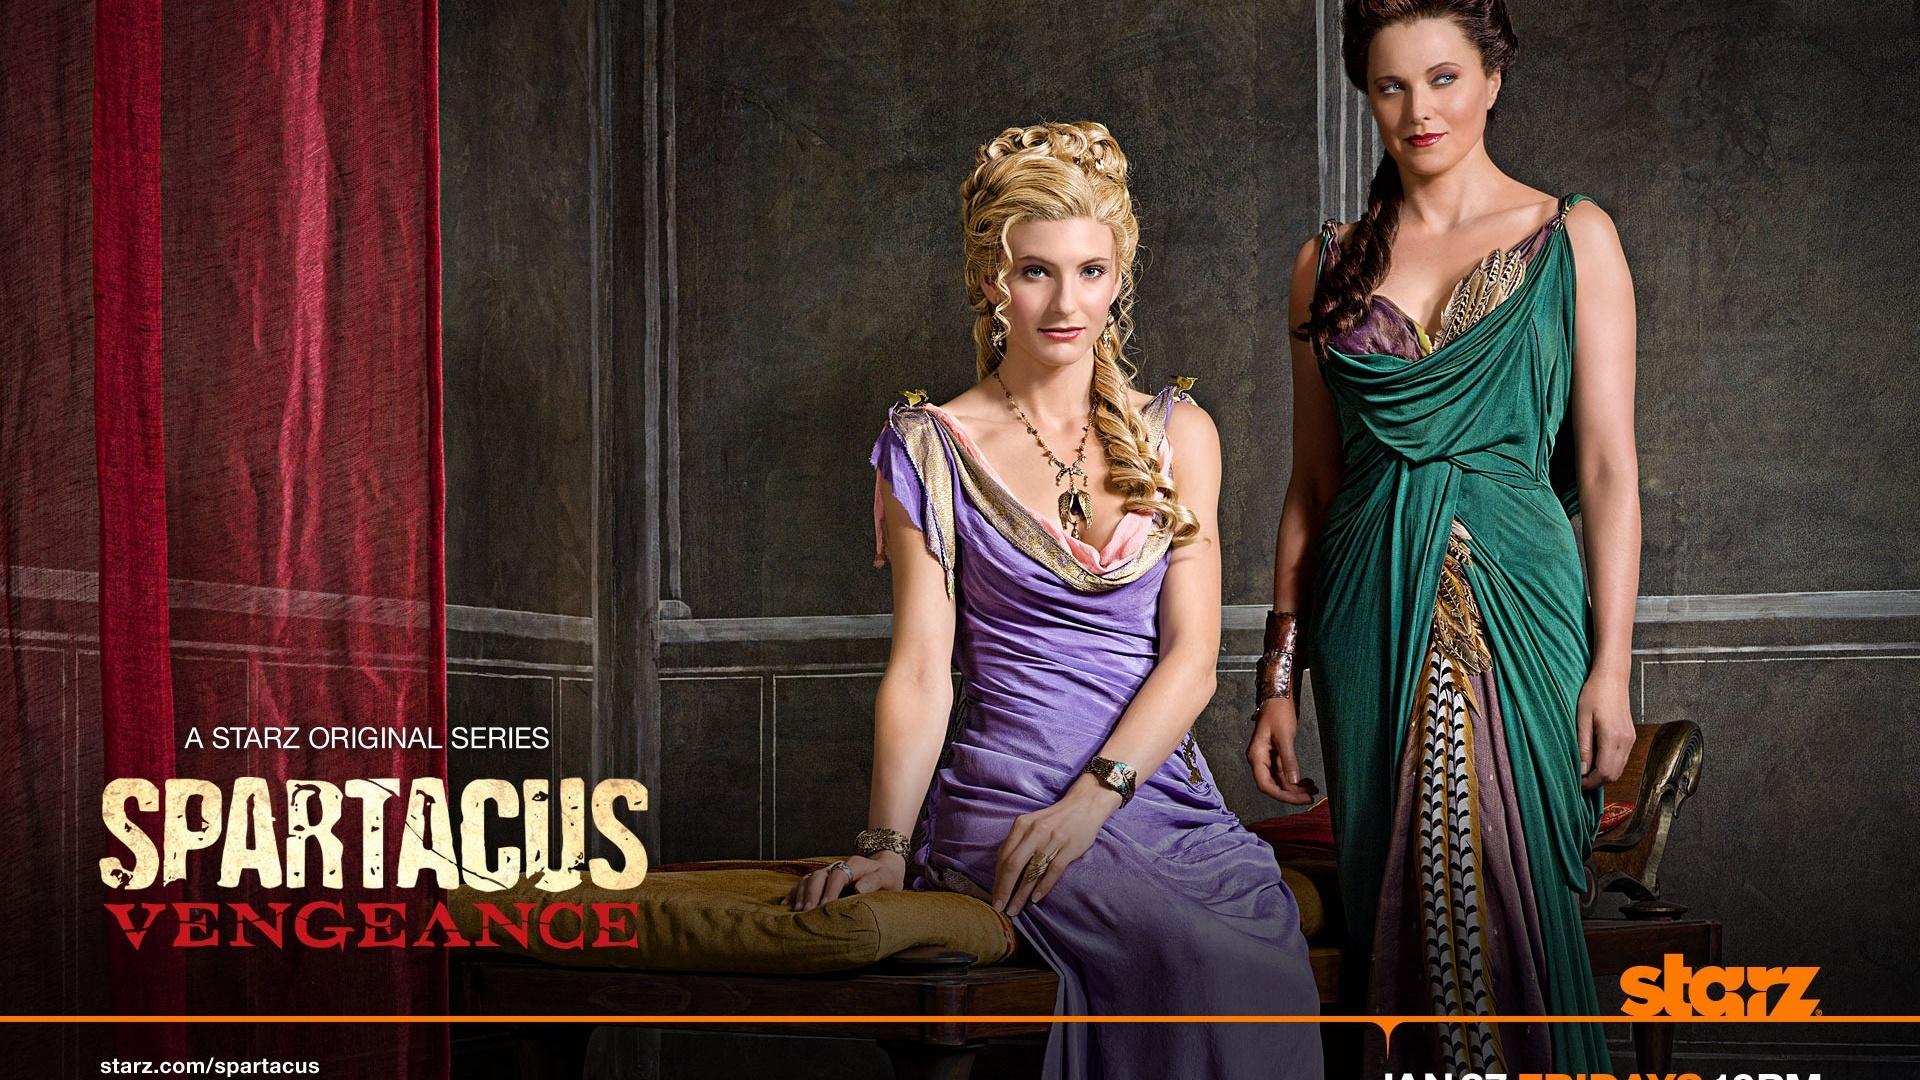 Viva Bianca in Spartacus: Vengeance Hintergrundbilder - 1920x1080 Full ... Viva